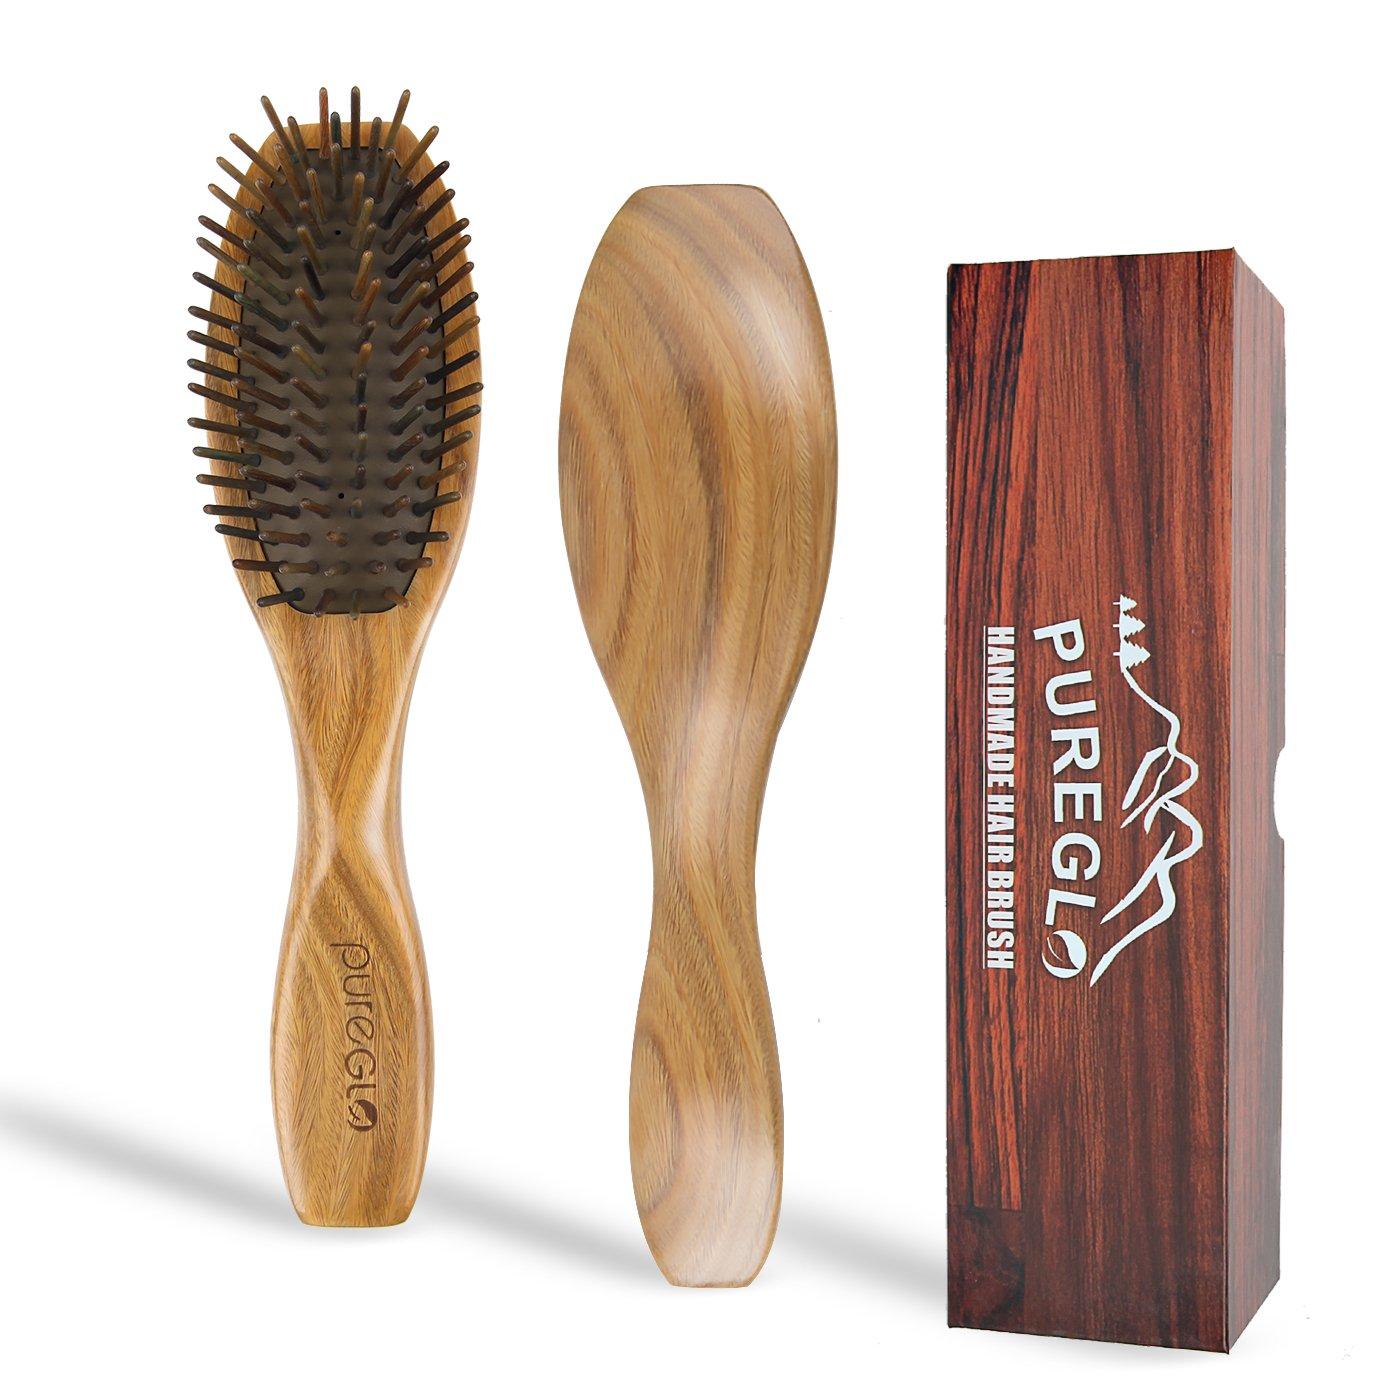 Beautifying Custom-Made Hair Brush Boxes | RSF Packaging